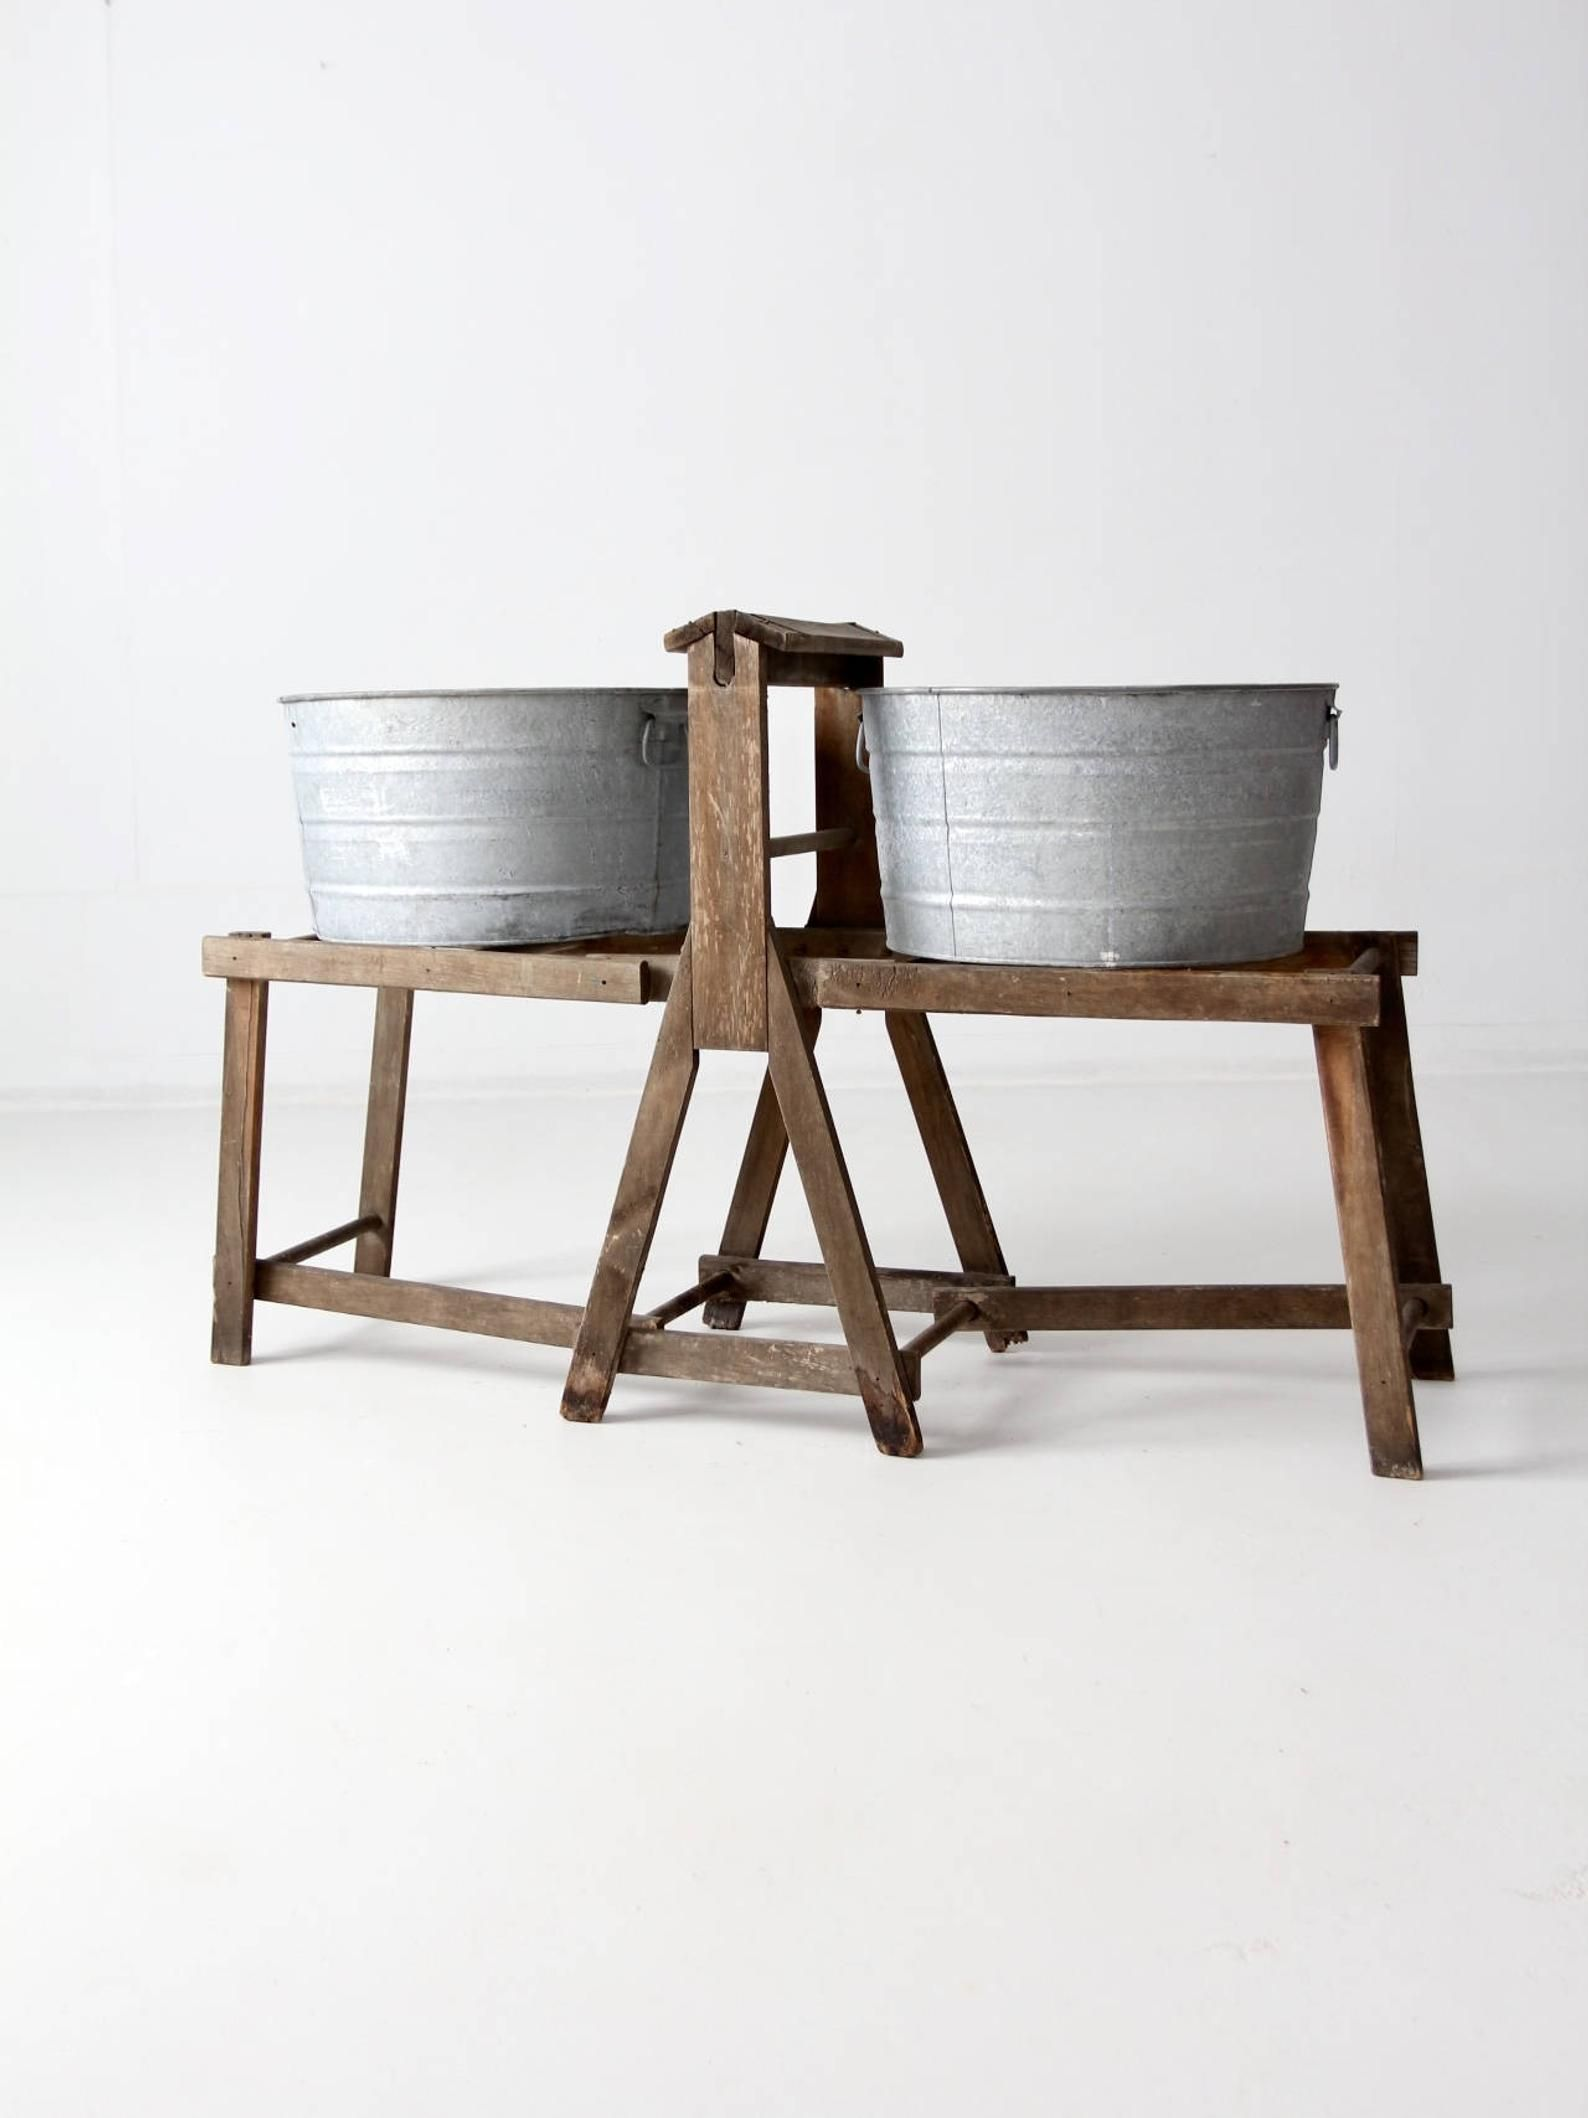 Antique Wash Tub Stand Primitive Laundry Stand Galvanized Tub